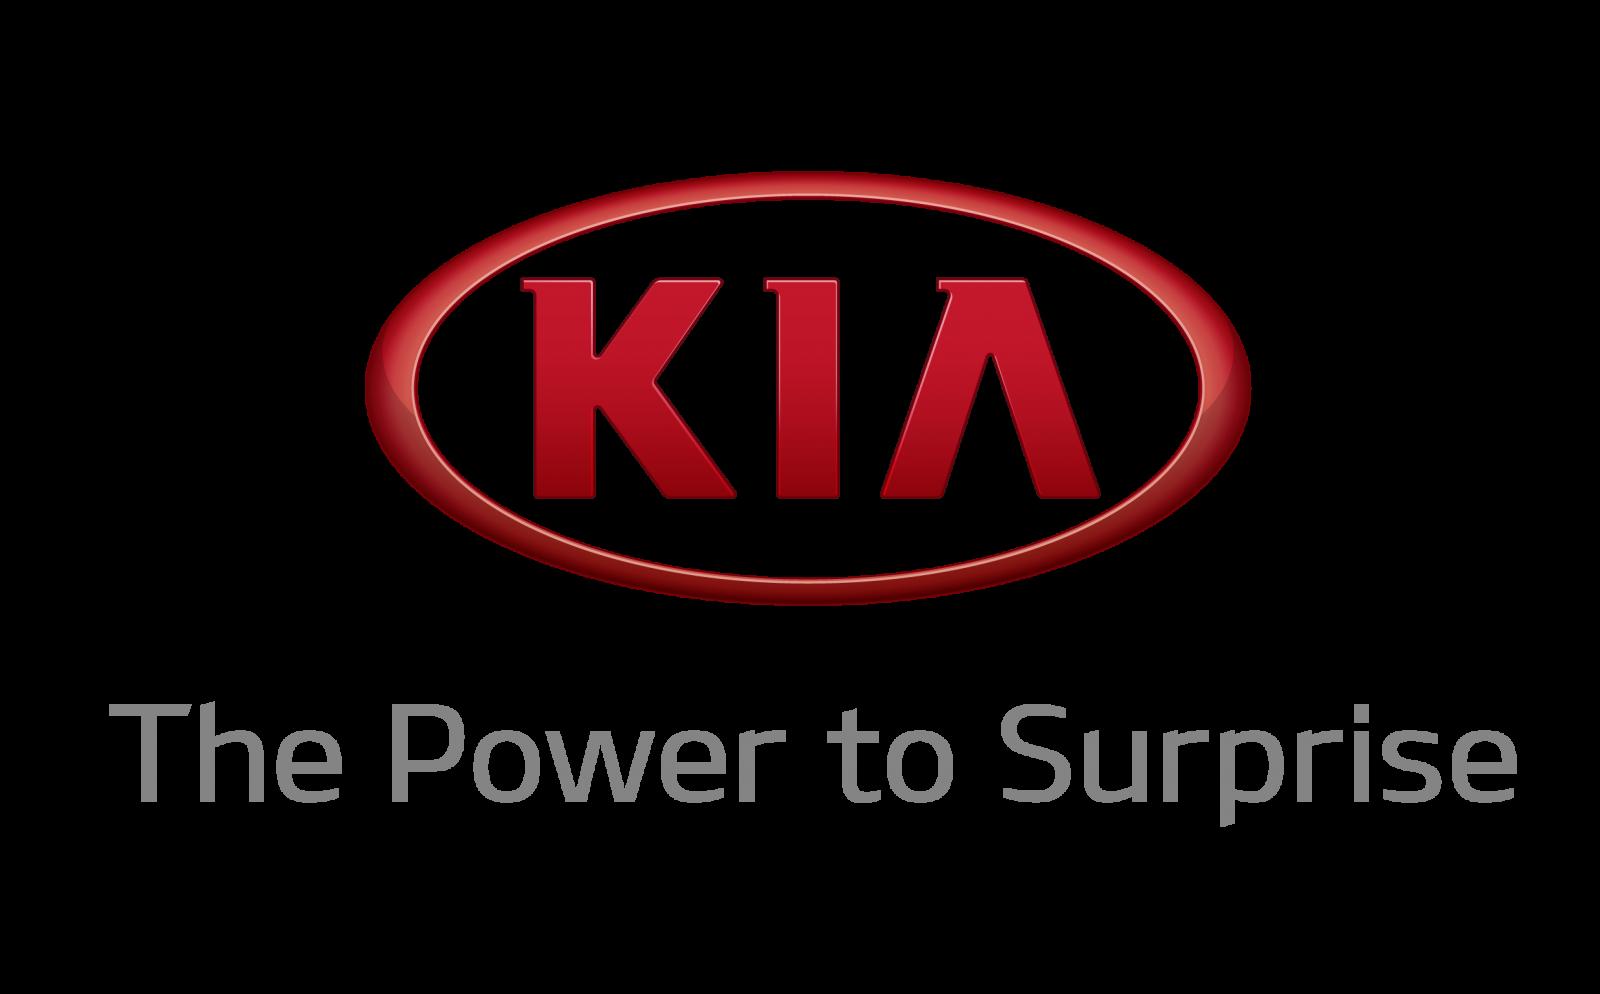 image kia power to surprise png logopedia fandom powered by wikia rh logos wikia com kia logo vectorizado kia logo vector free download